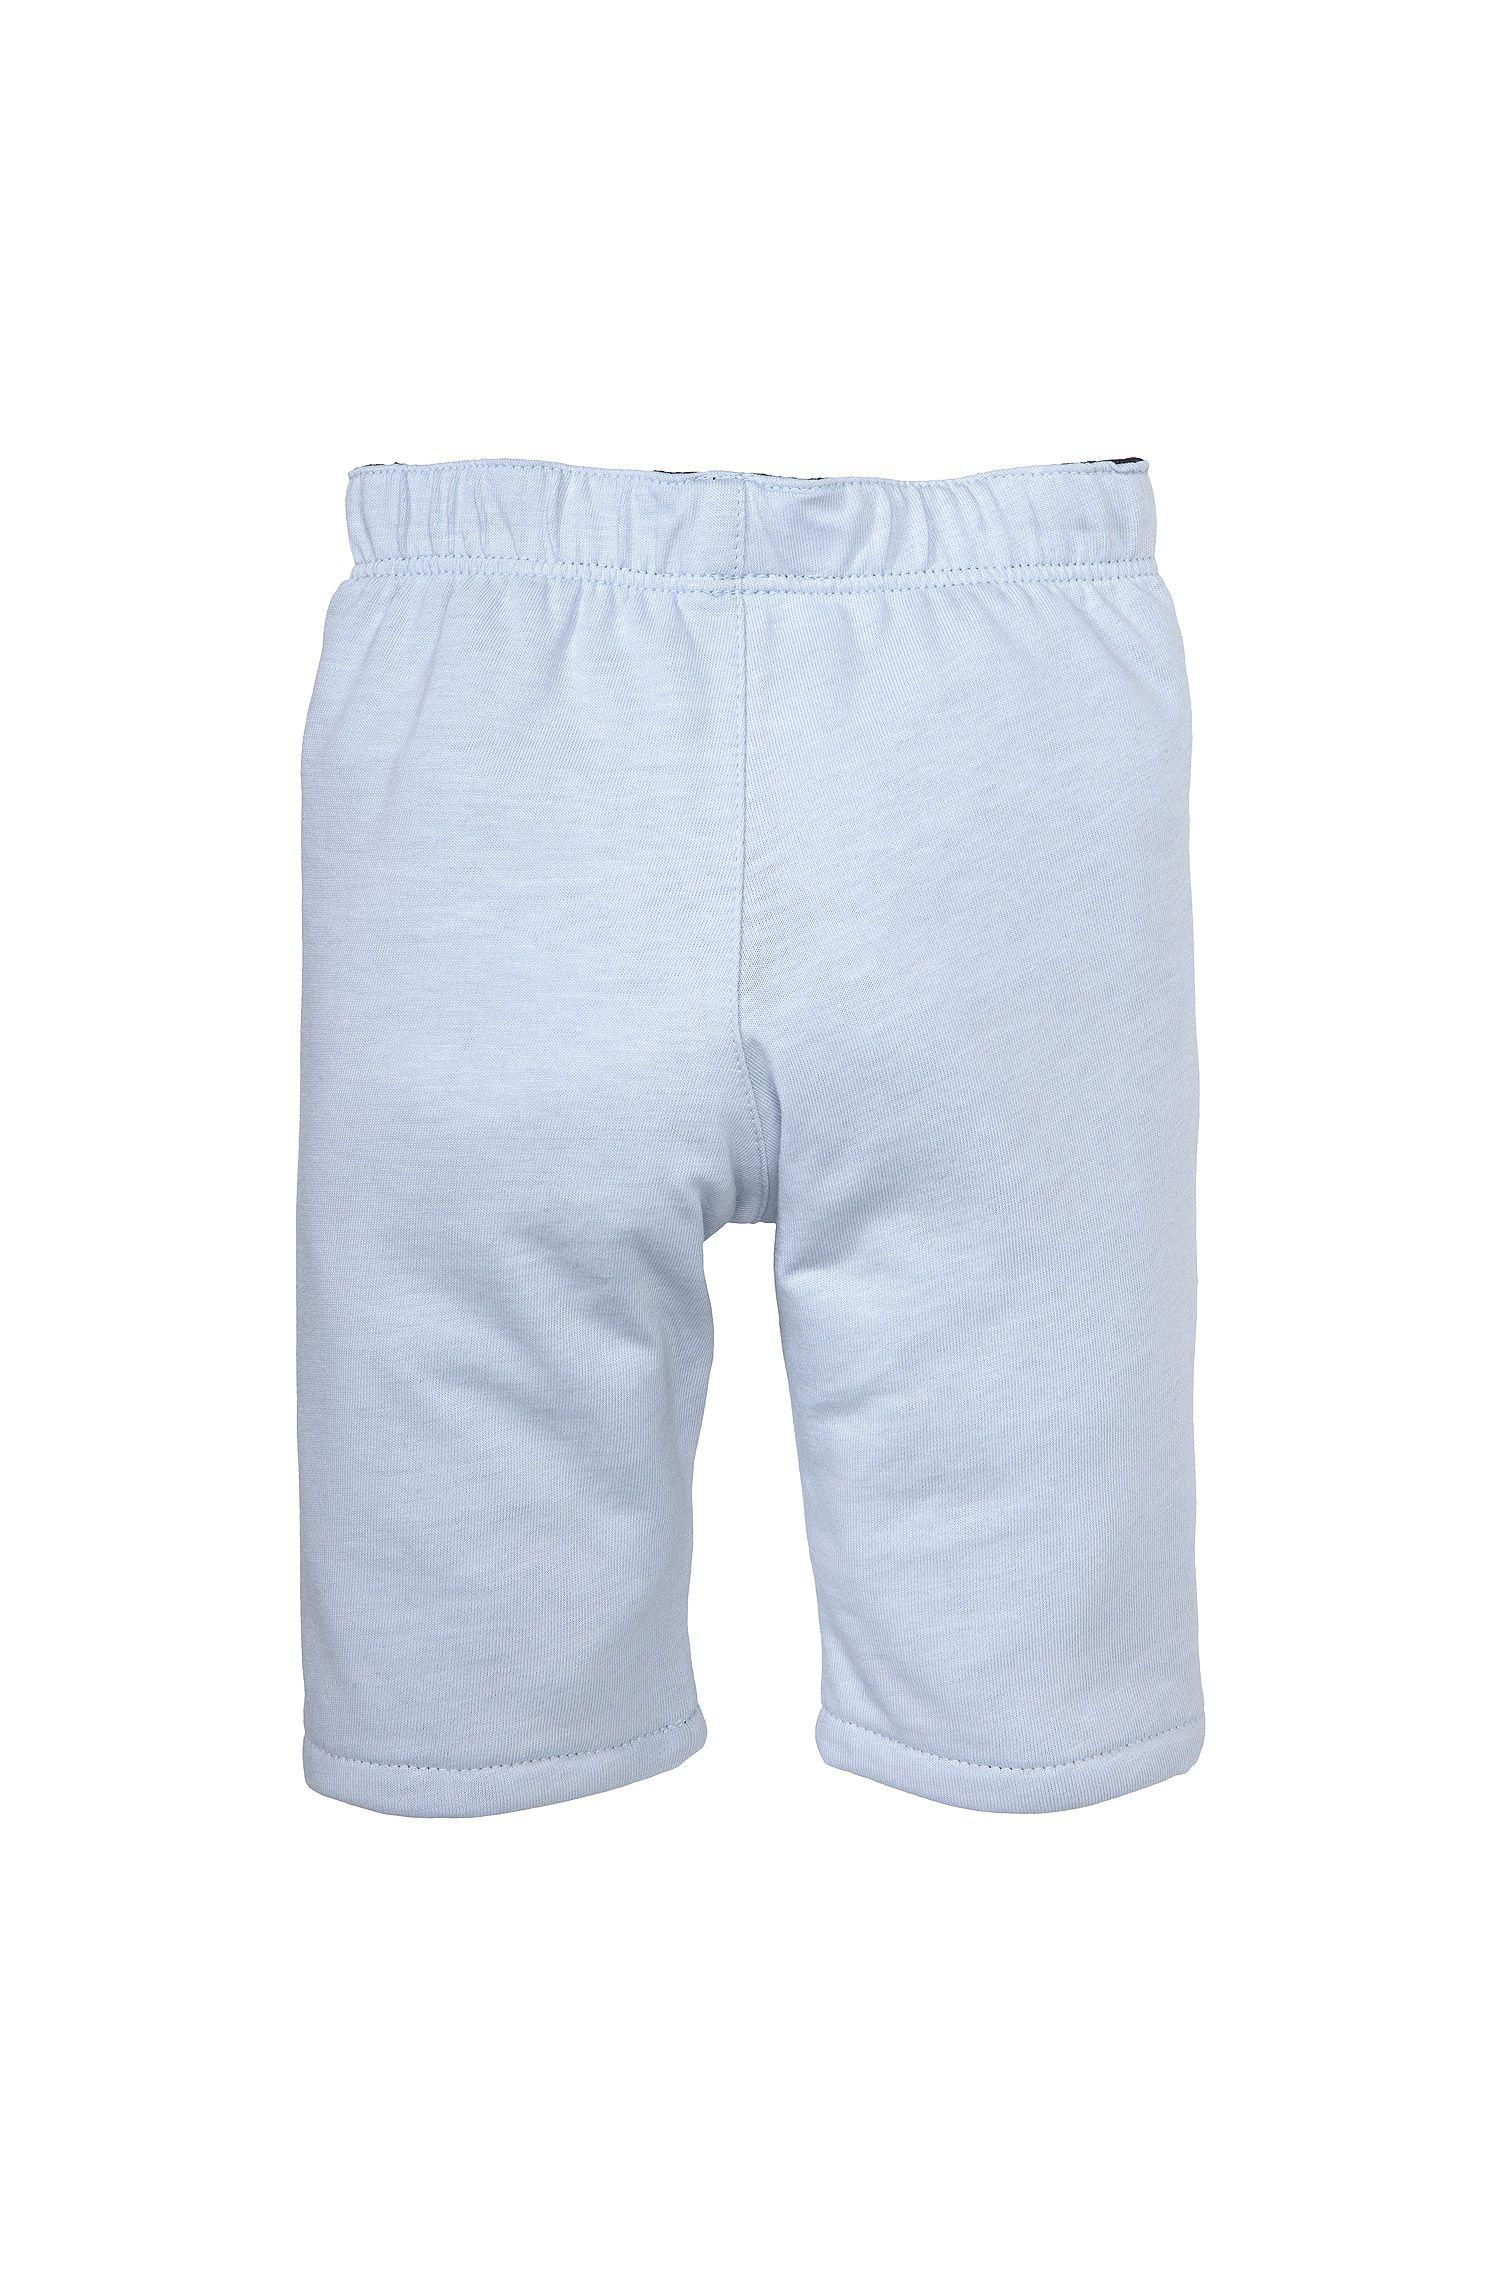 Pantalon réversible pour enfants «J94100» en coton